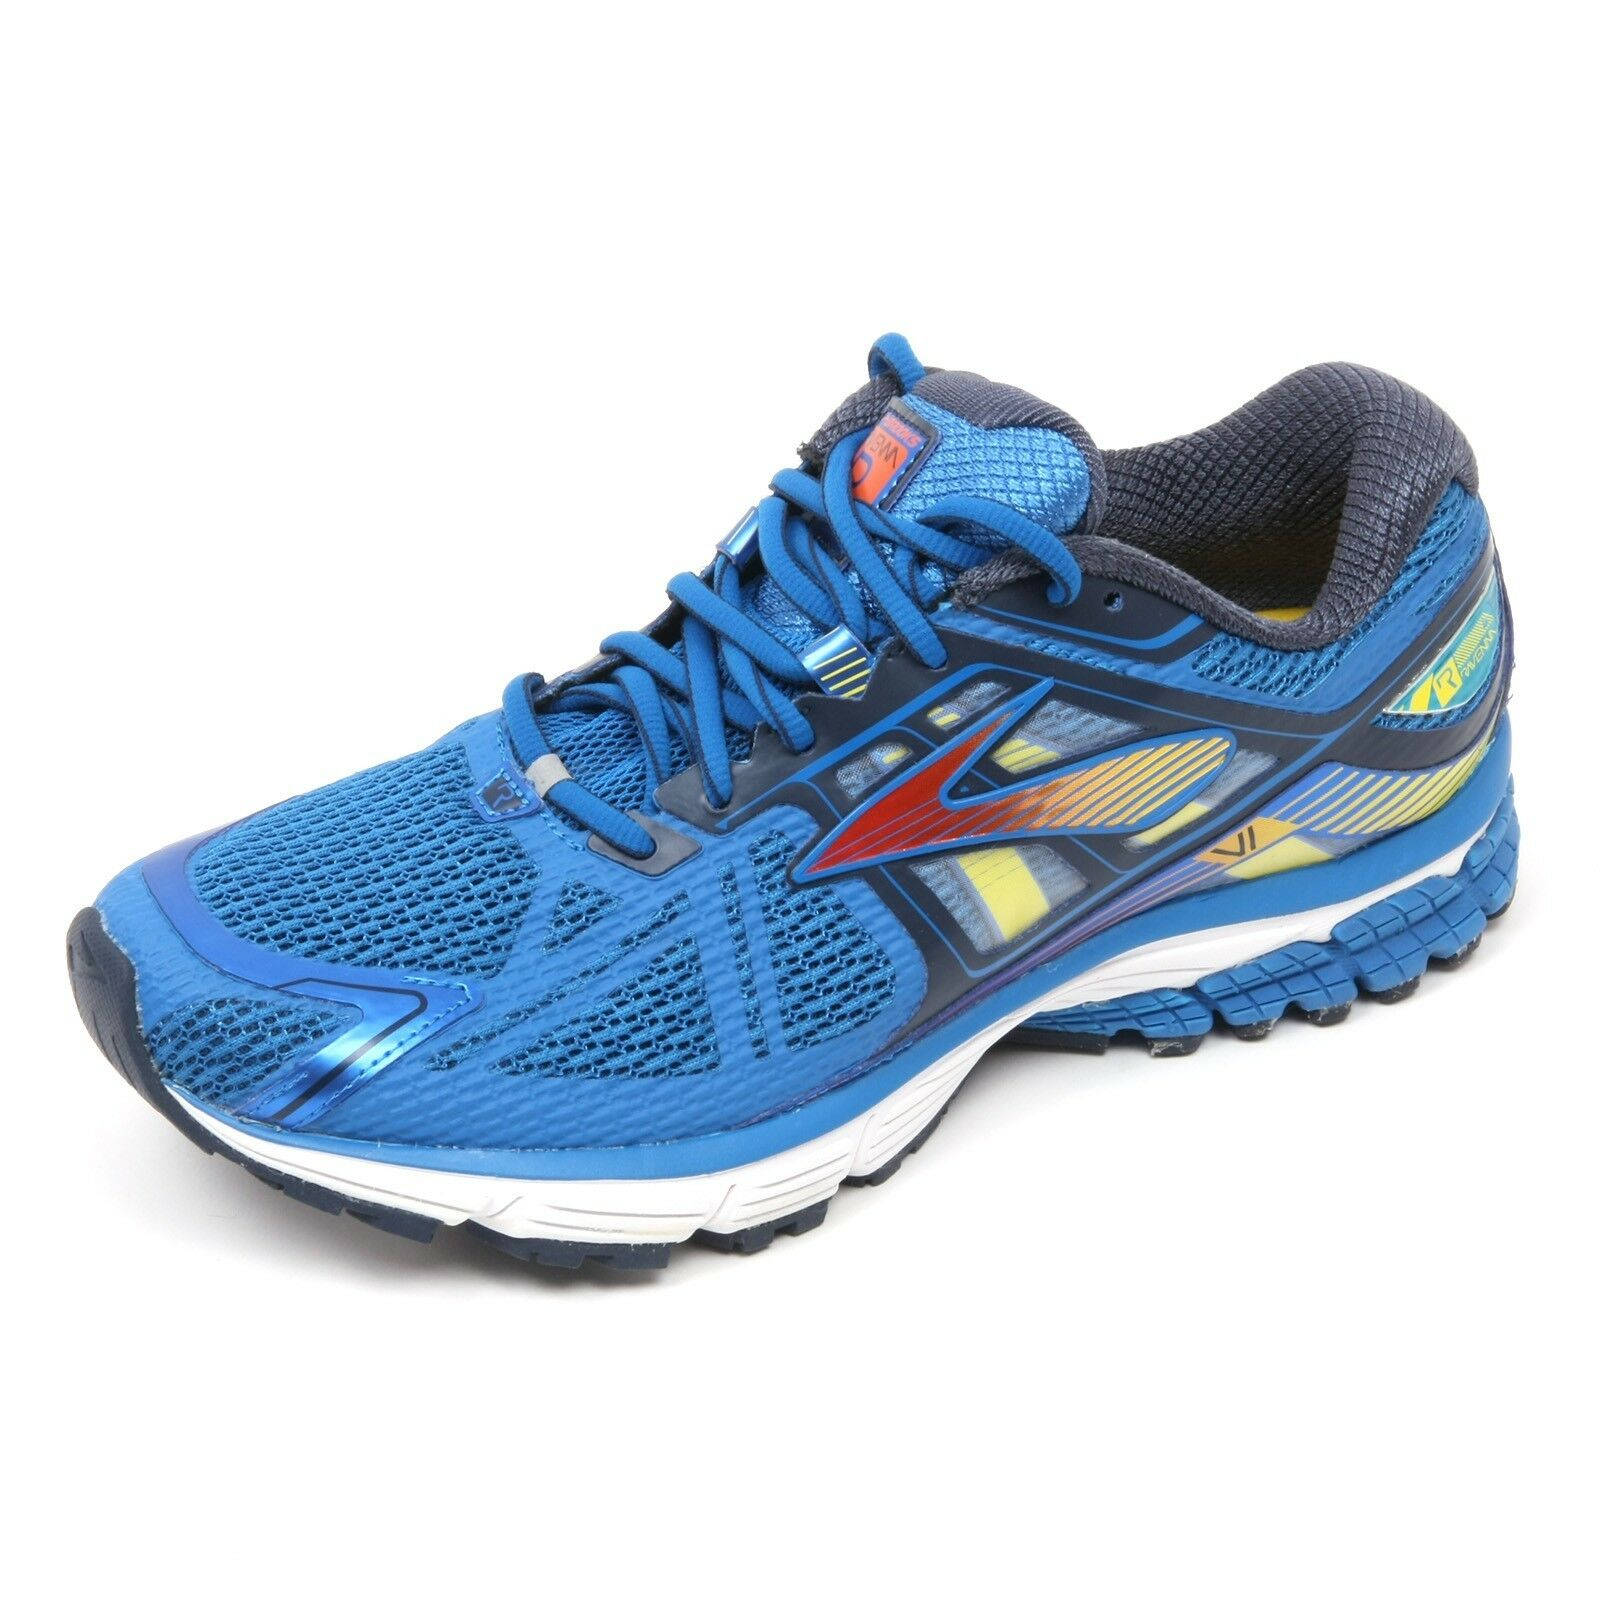 C4758 sneaker azzurro hombre BROOKS RAVENNA 6 Zapatos azzurro sneaker scuro Zapatos Hombre 02d31e